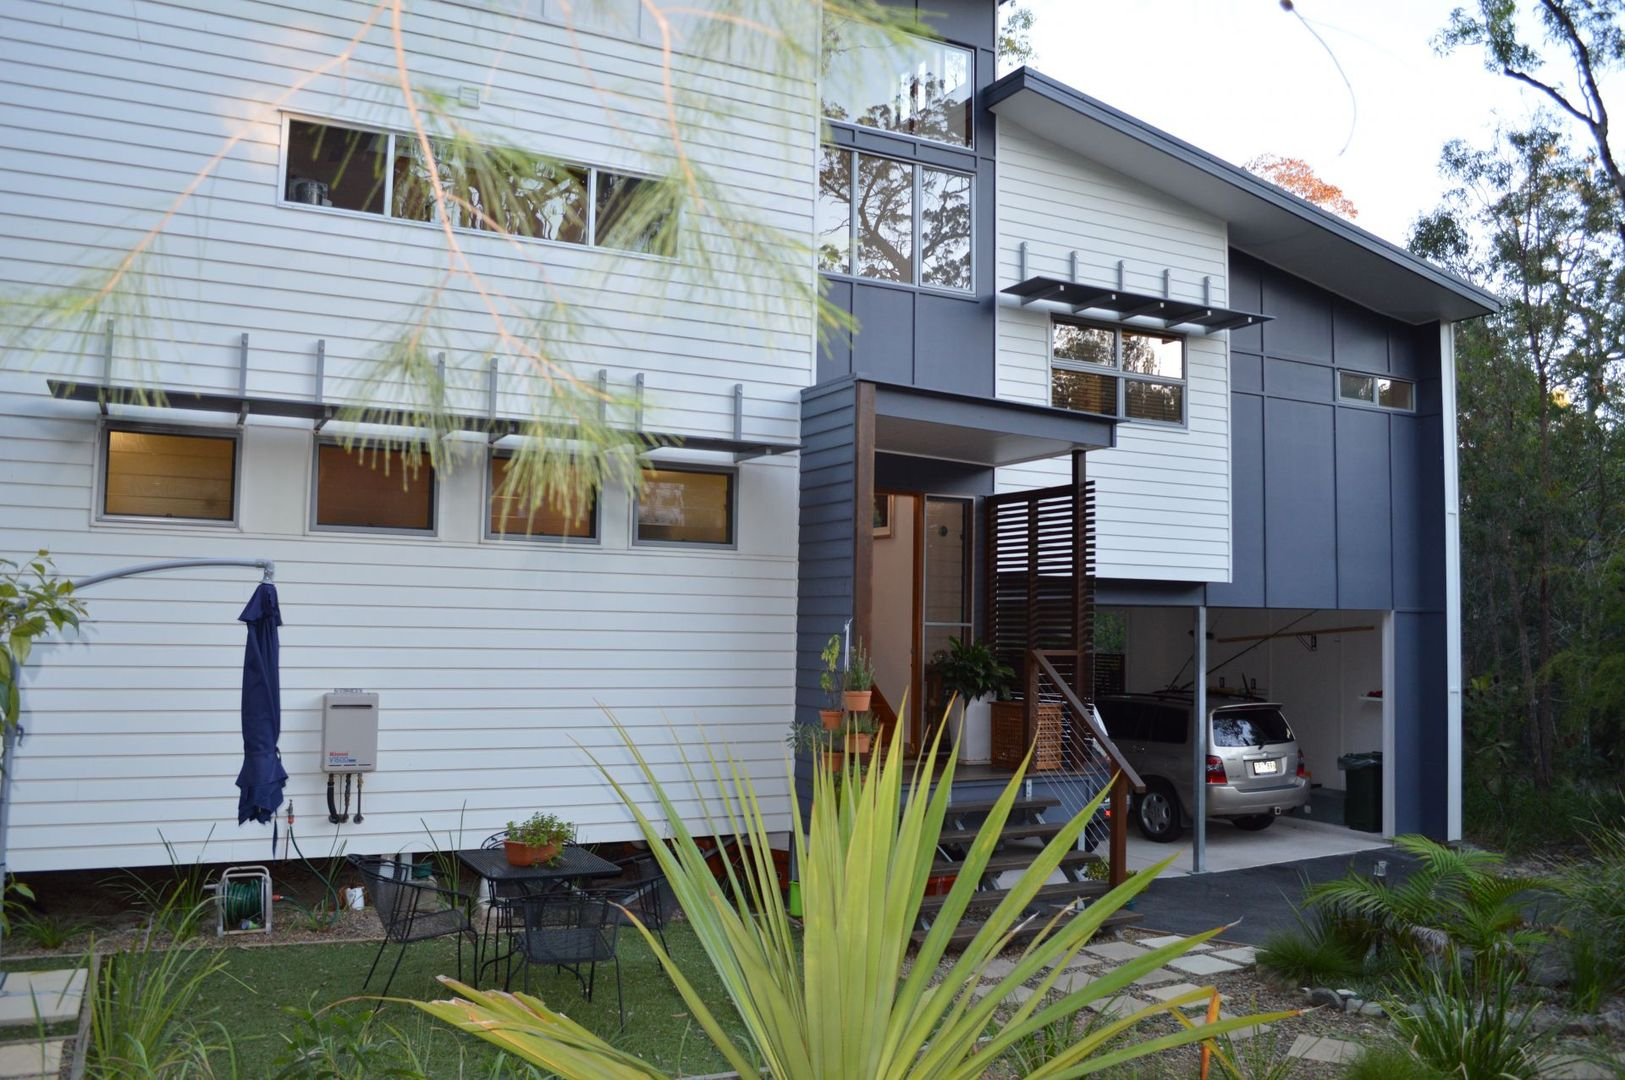 38/90 Beach Road, Noosa North Shore QLD 4565, Image 1